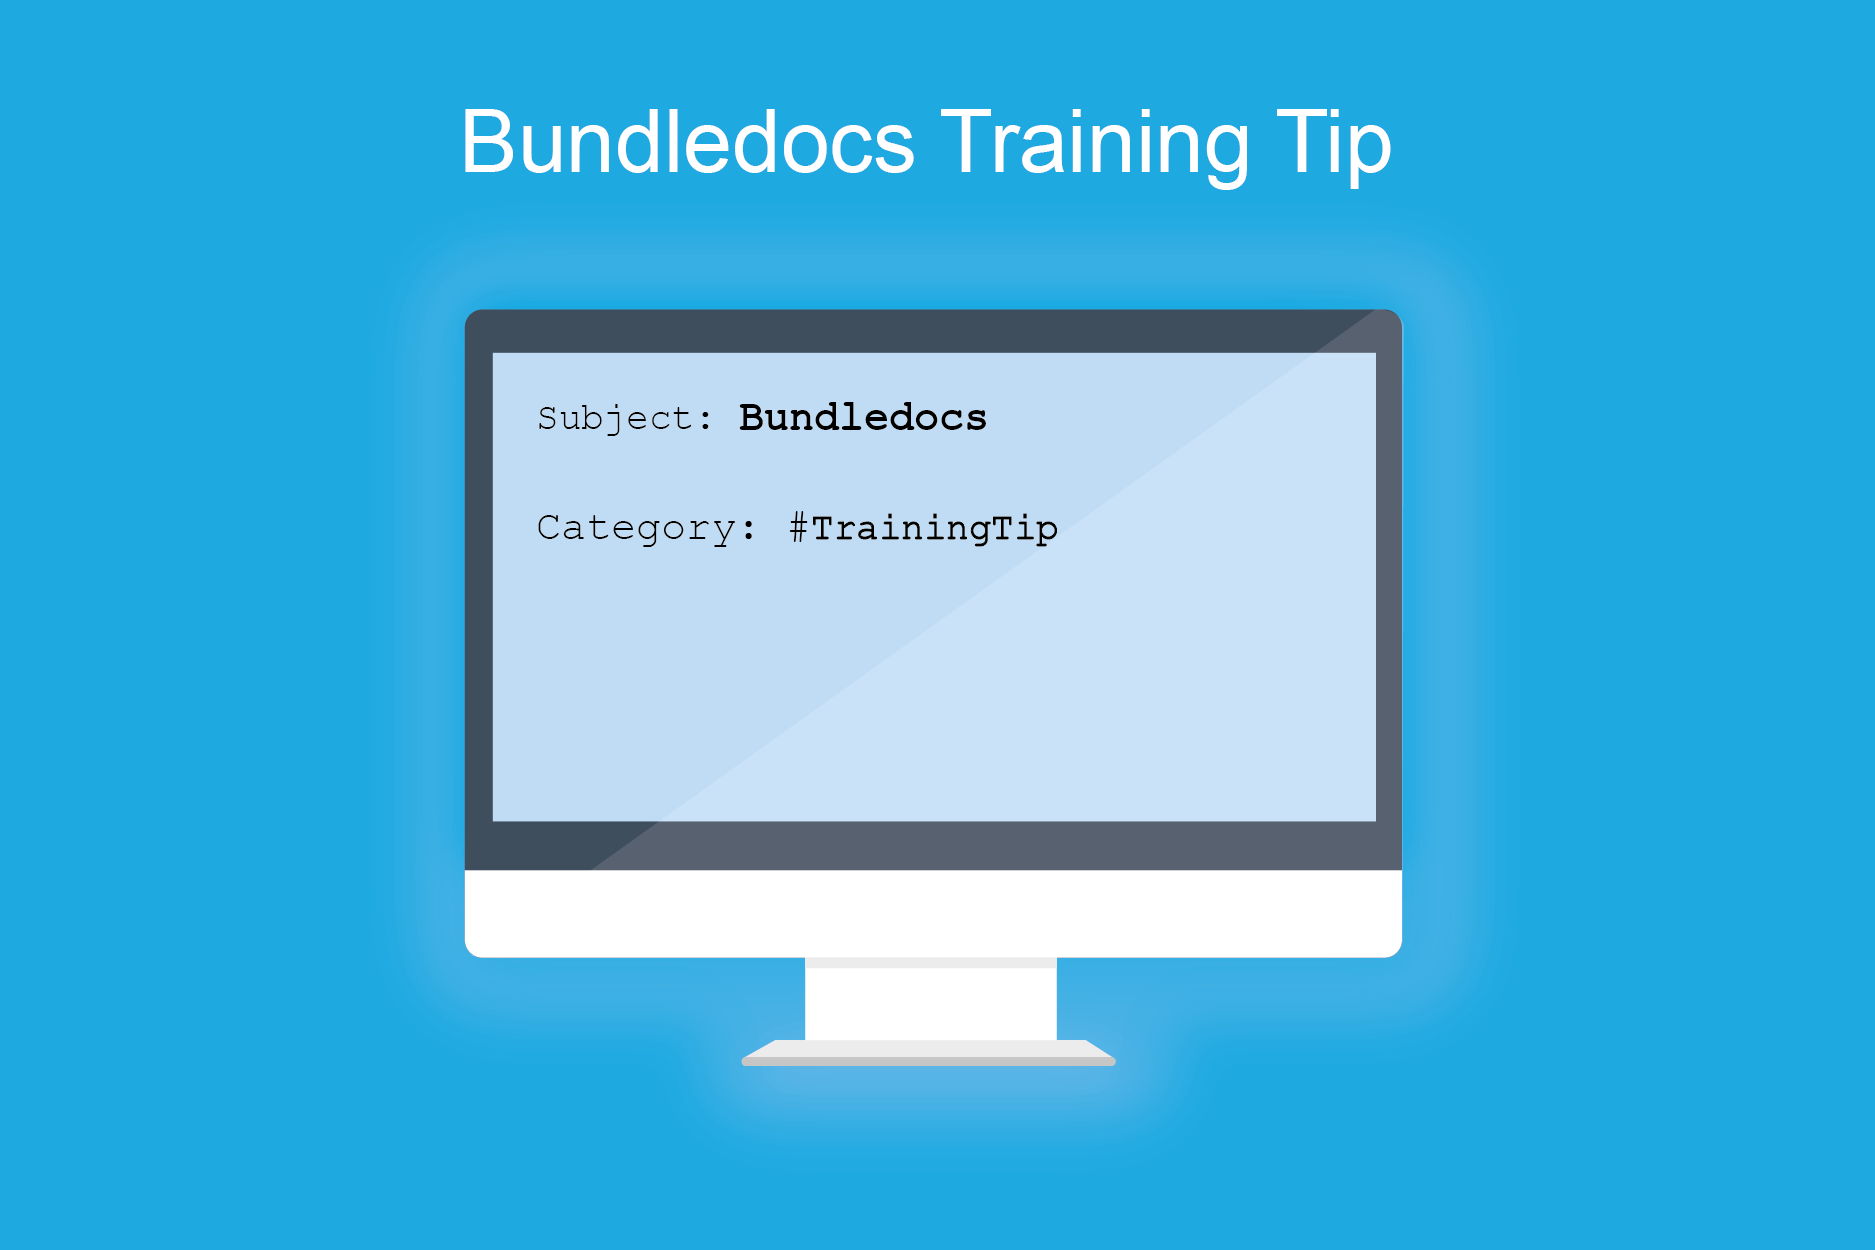 Bundledocs_Training_Tip_Image.png